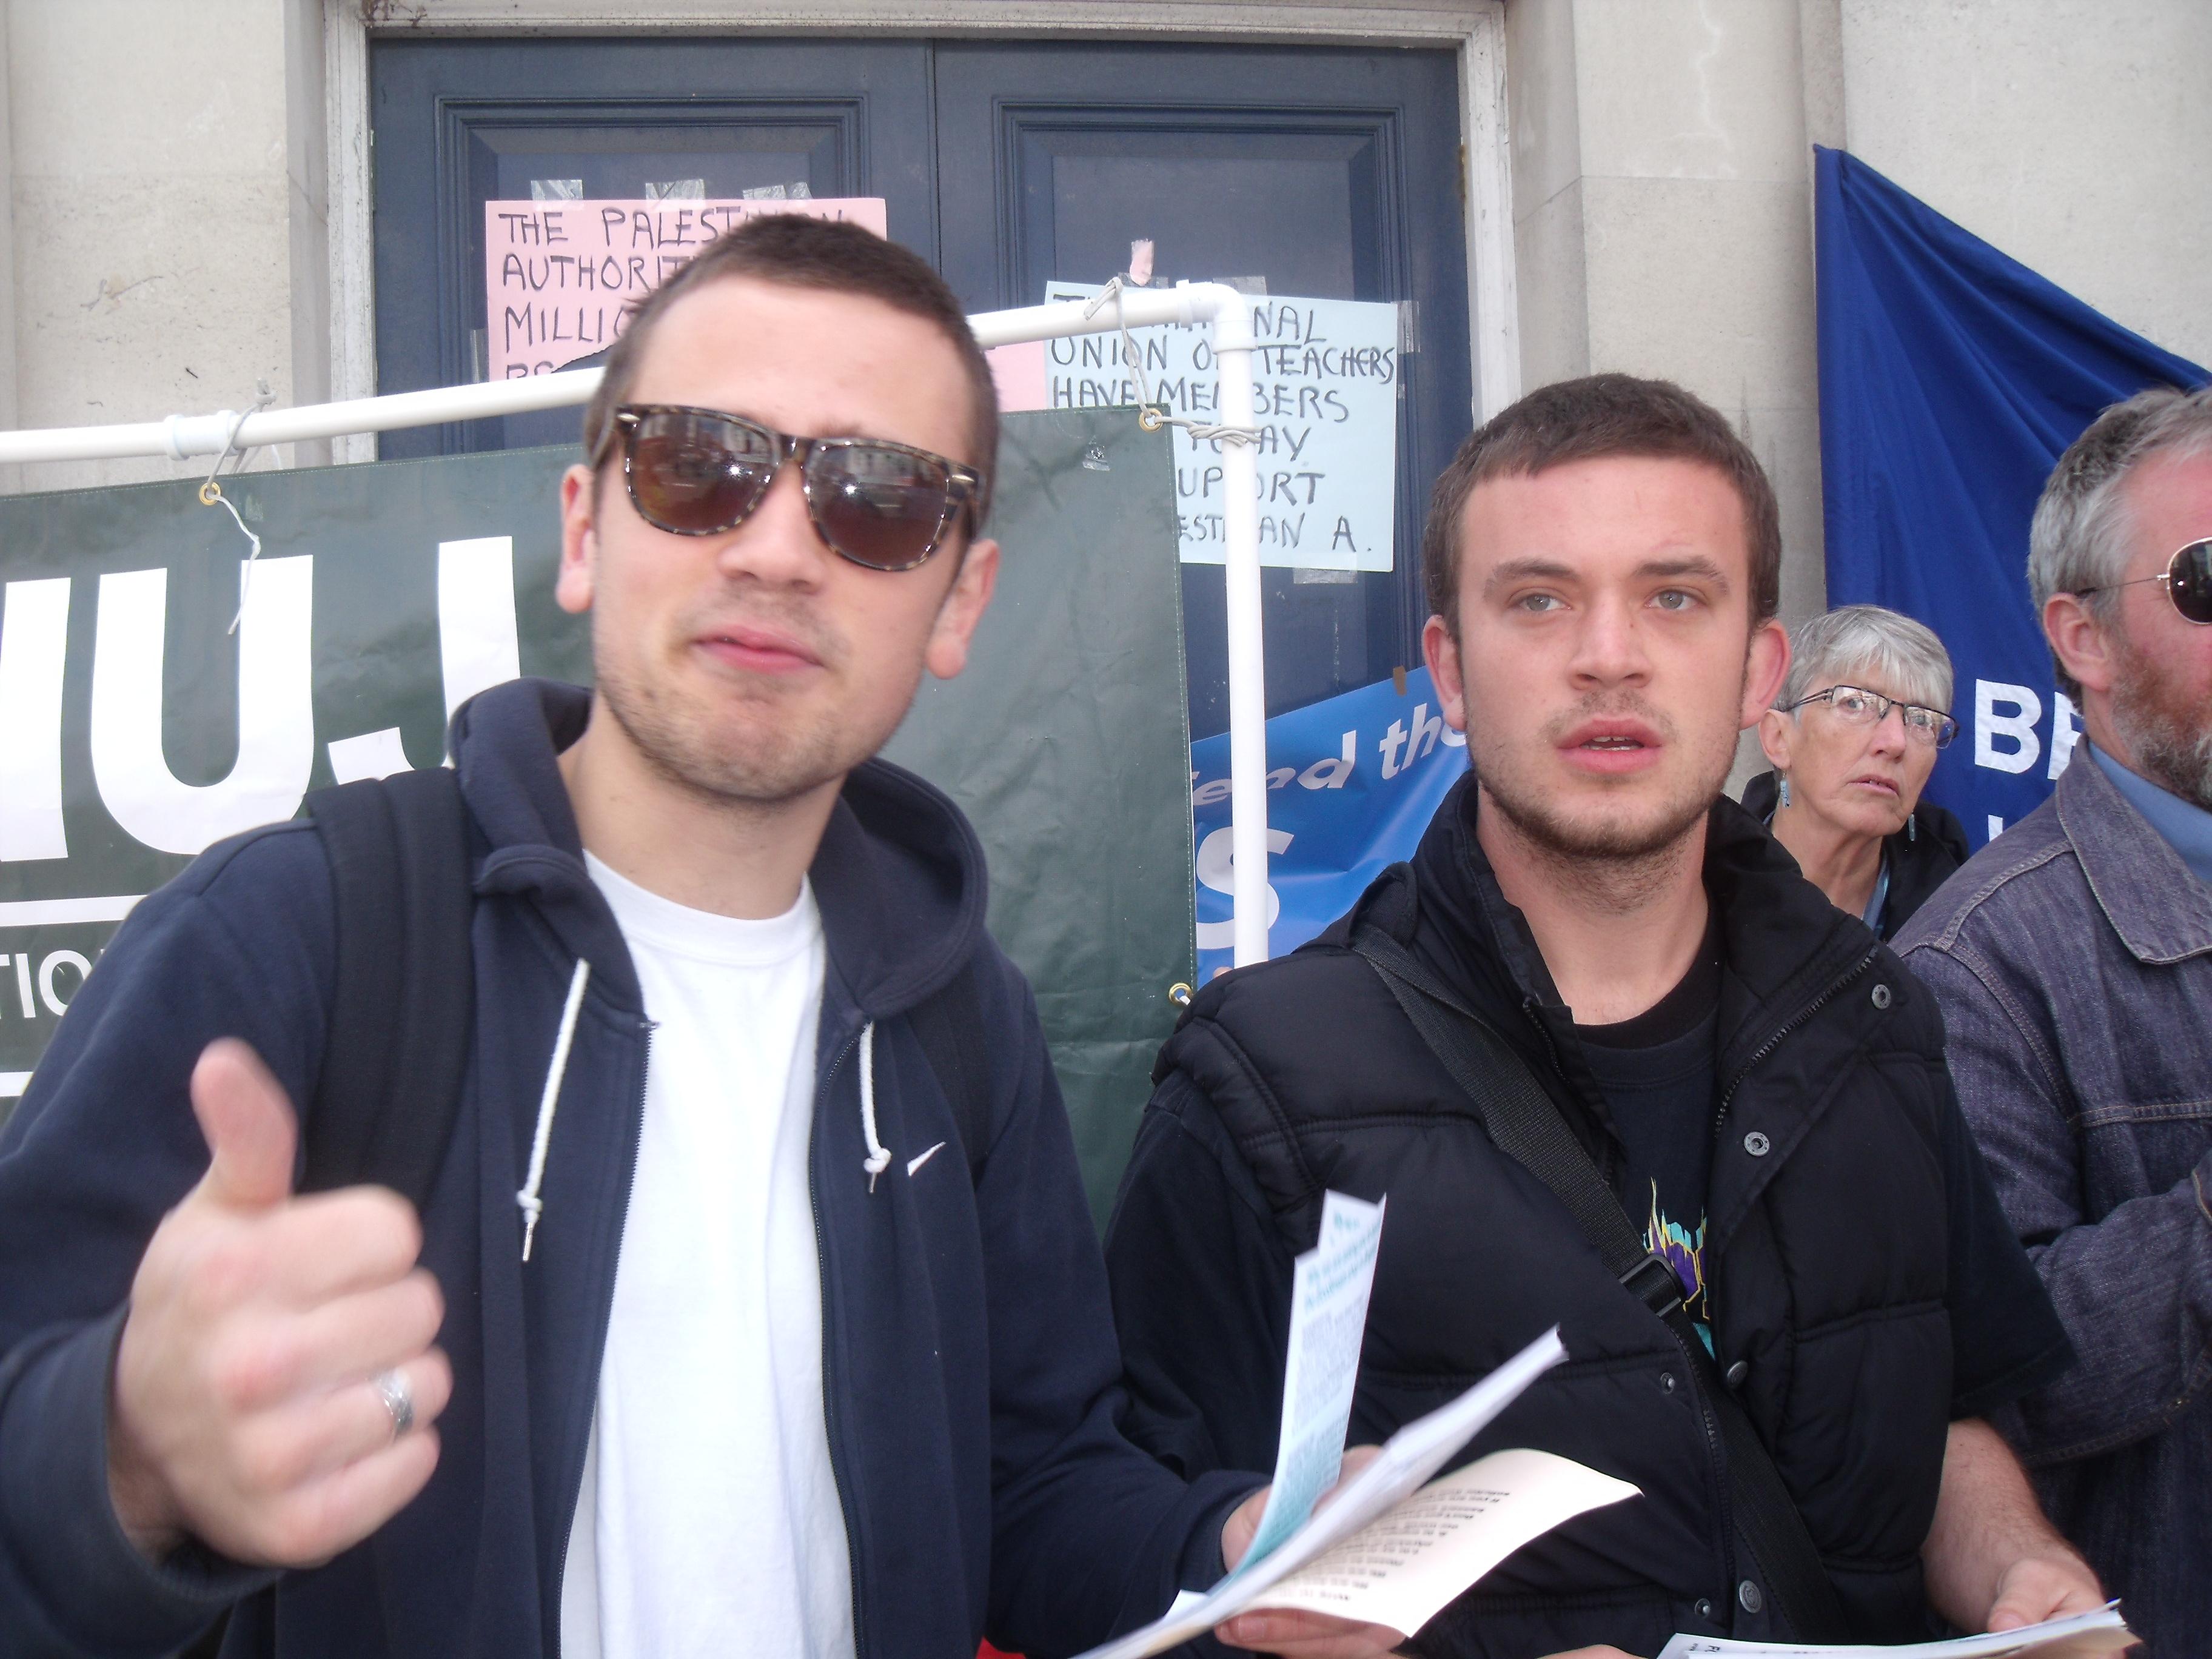 Some dashing anti-Israel trade unionists.